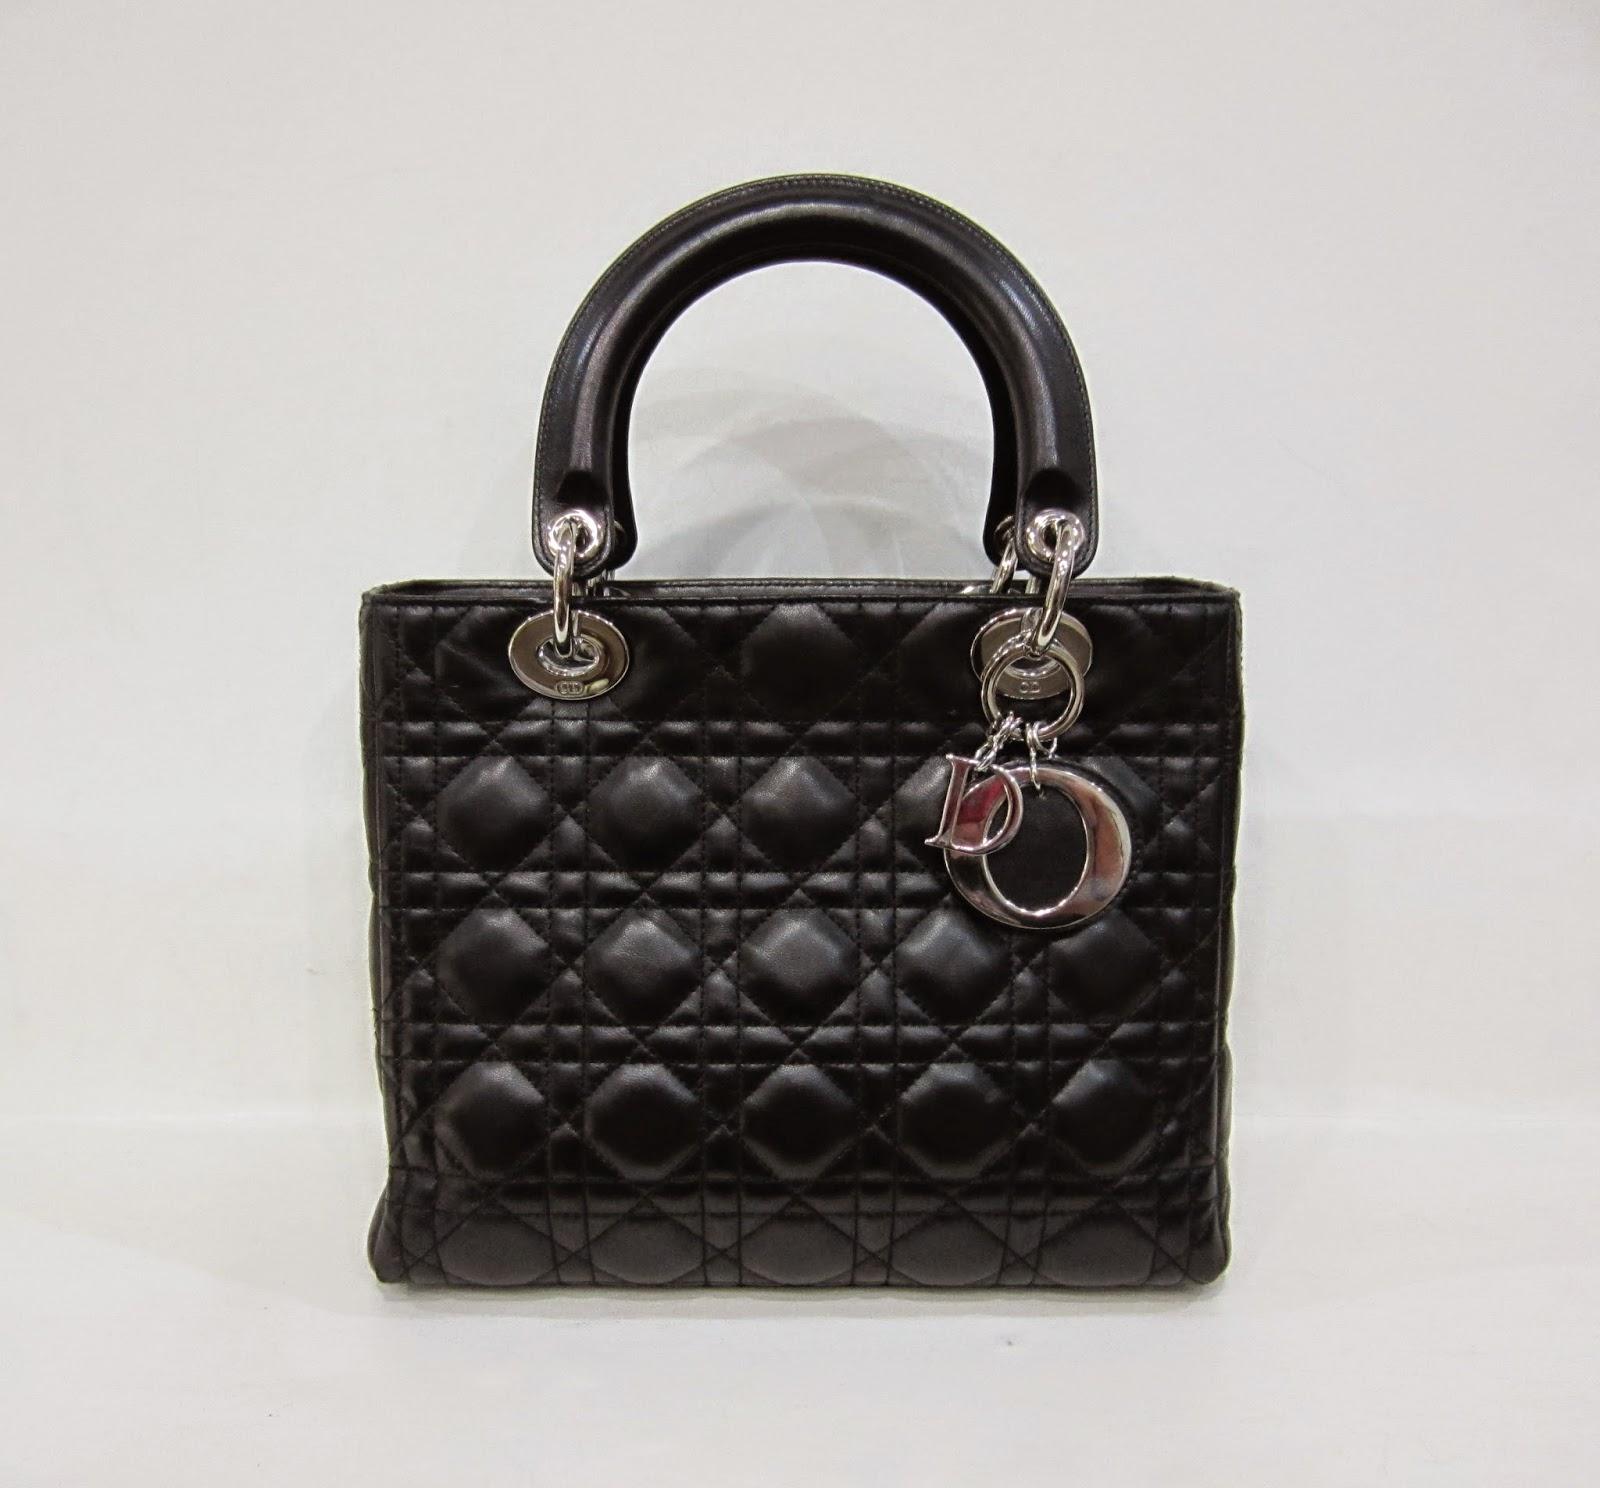 Christian Dior Black Leather Lady Dior Bag